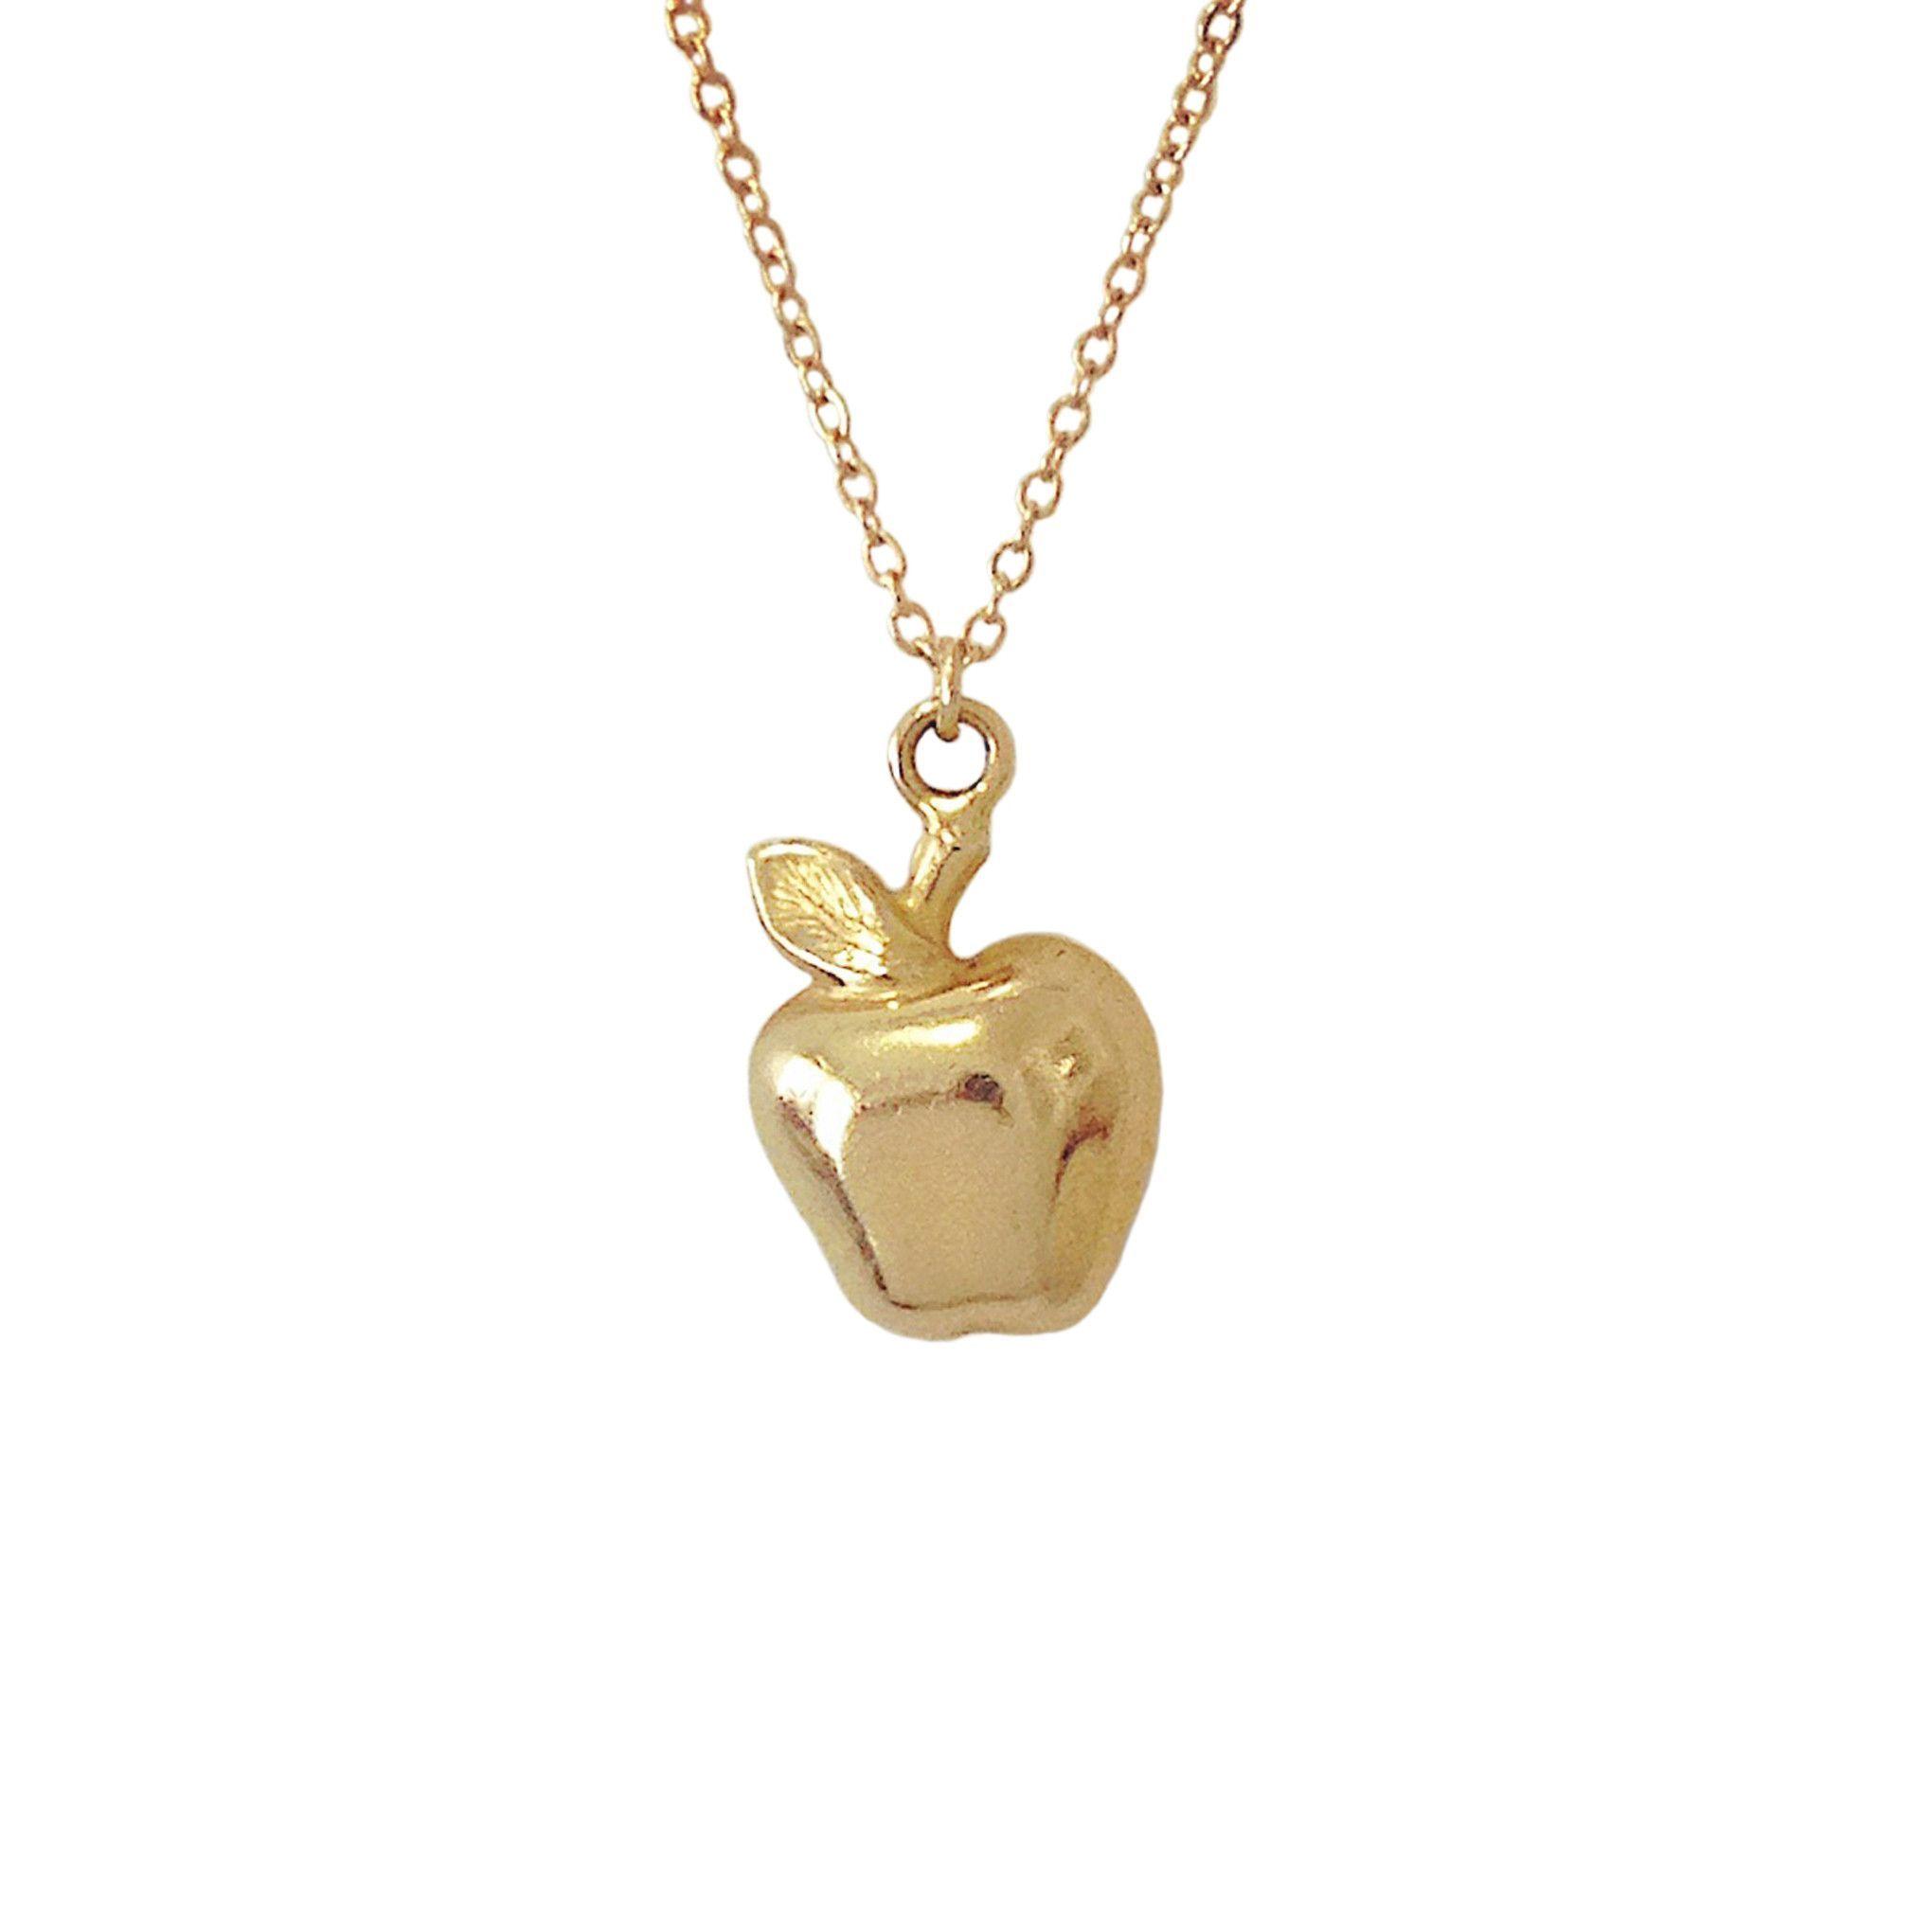 14k golden apple pendant necklace apples pendants and products 14k golden apple pendant necklace aloadofball Gallery